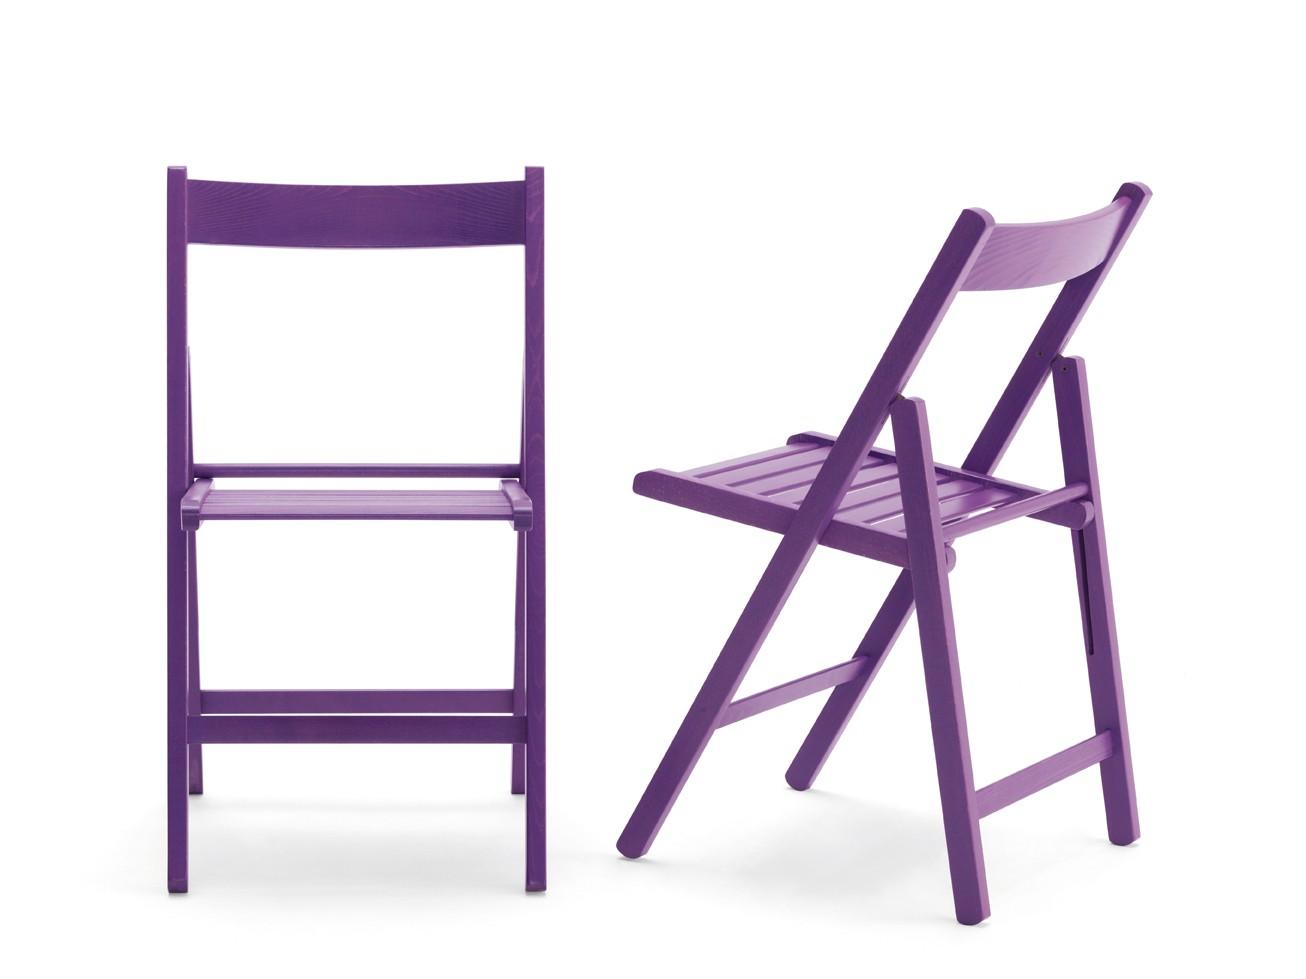 Sillas de plastico baratas sillas plastico varios colores for Sillas de plastico baratas